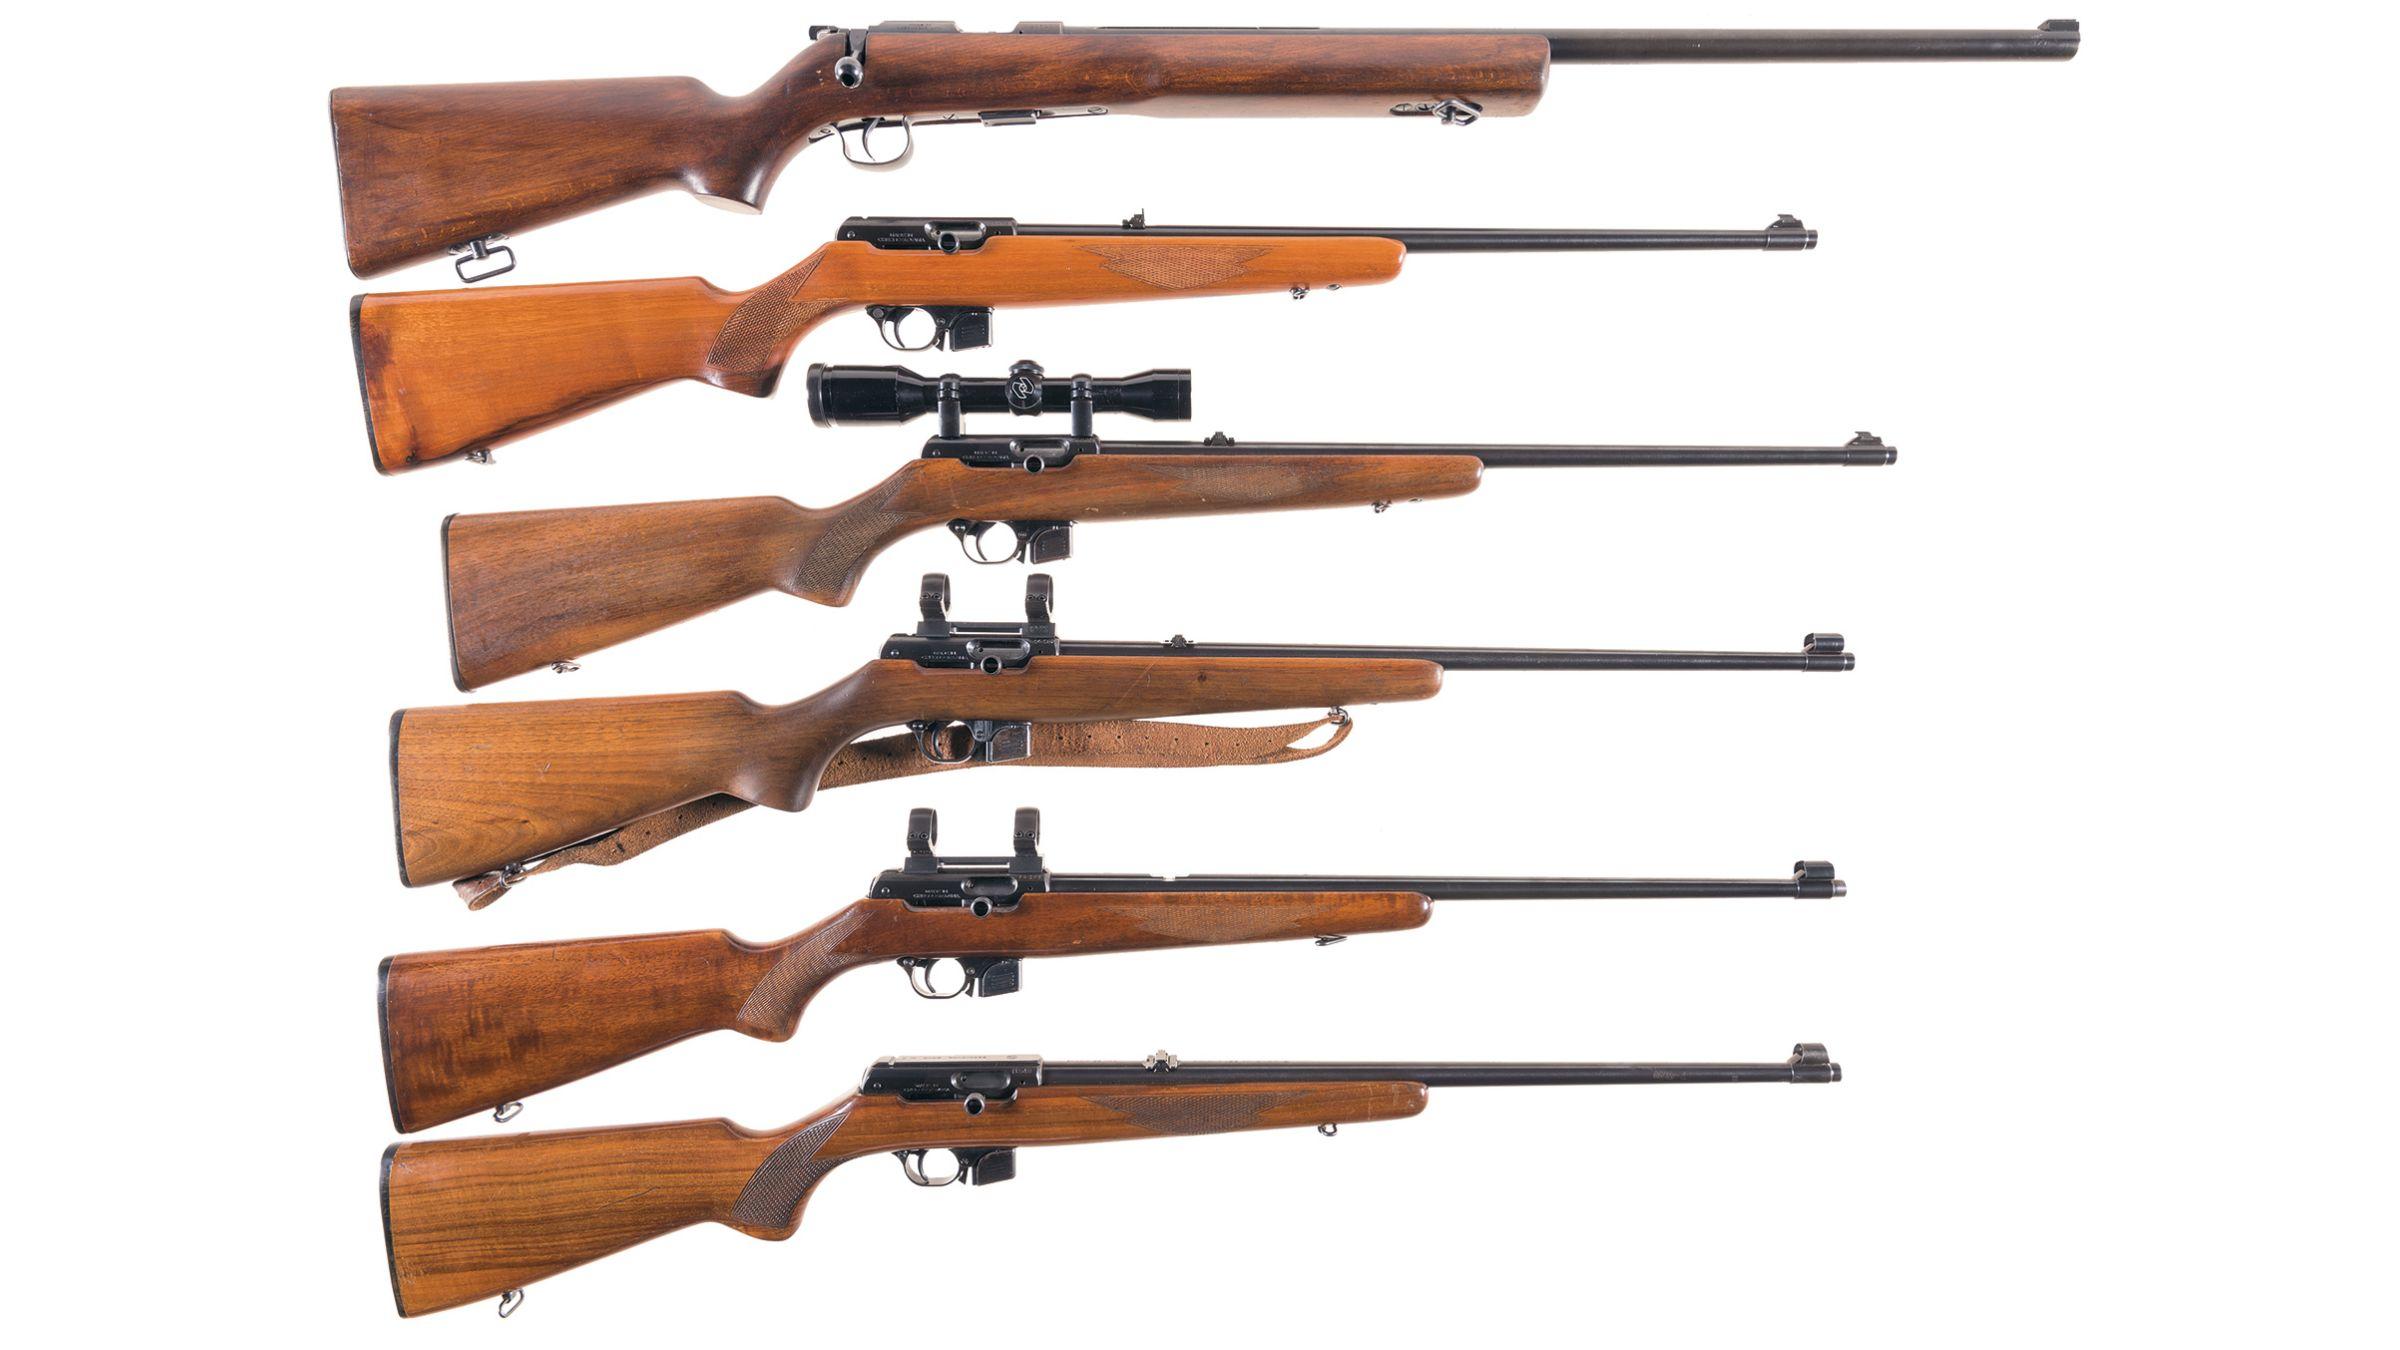 Six CZ/Brno Sporting Rifles